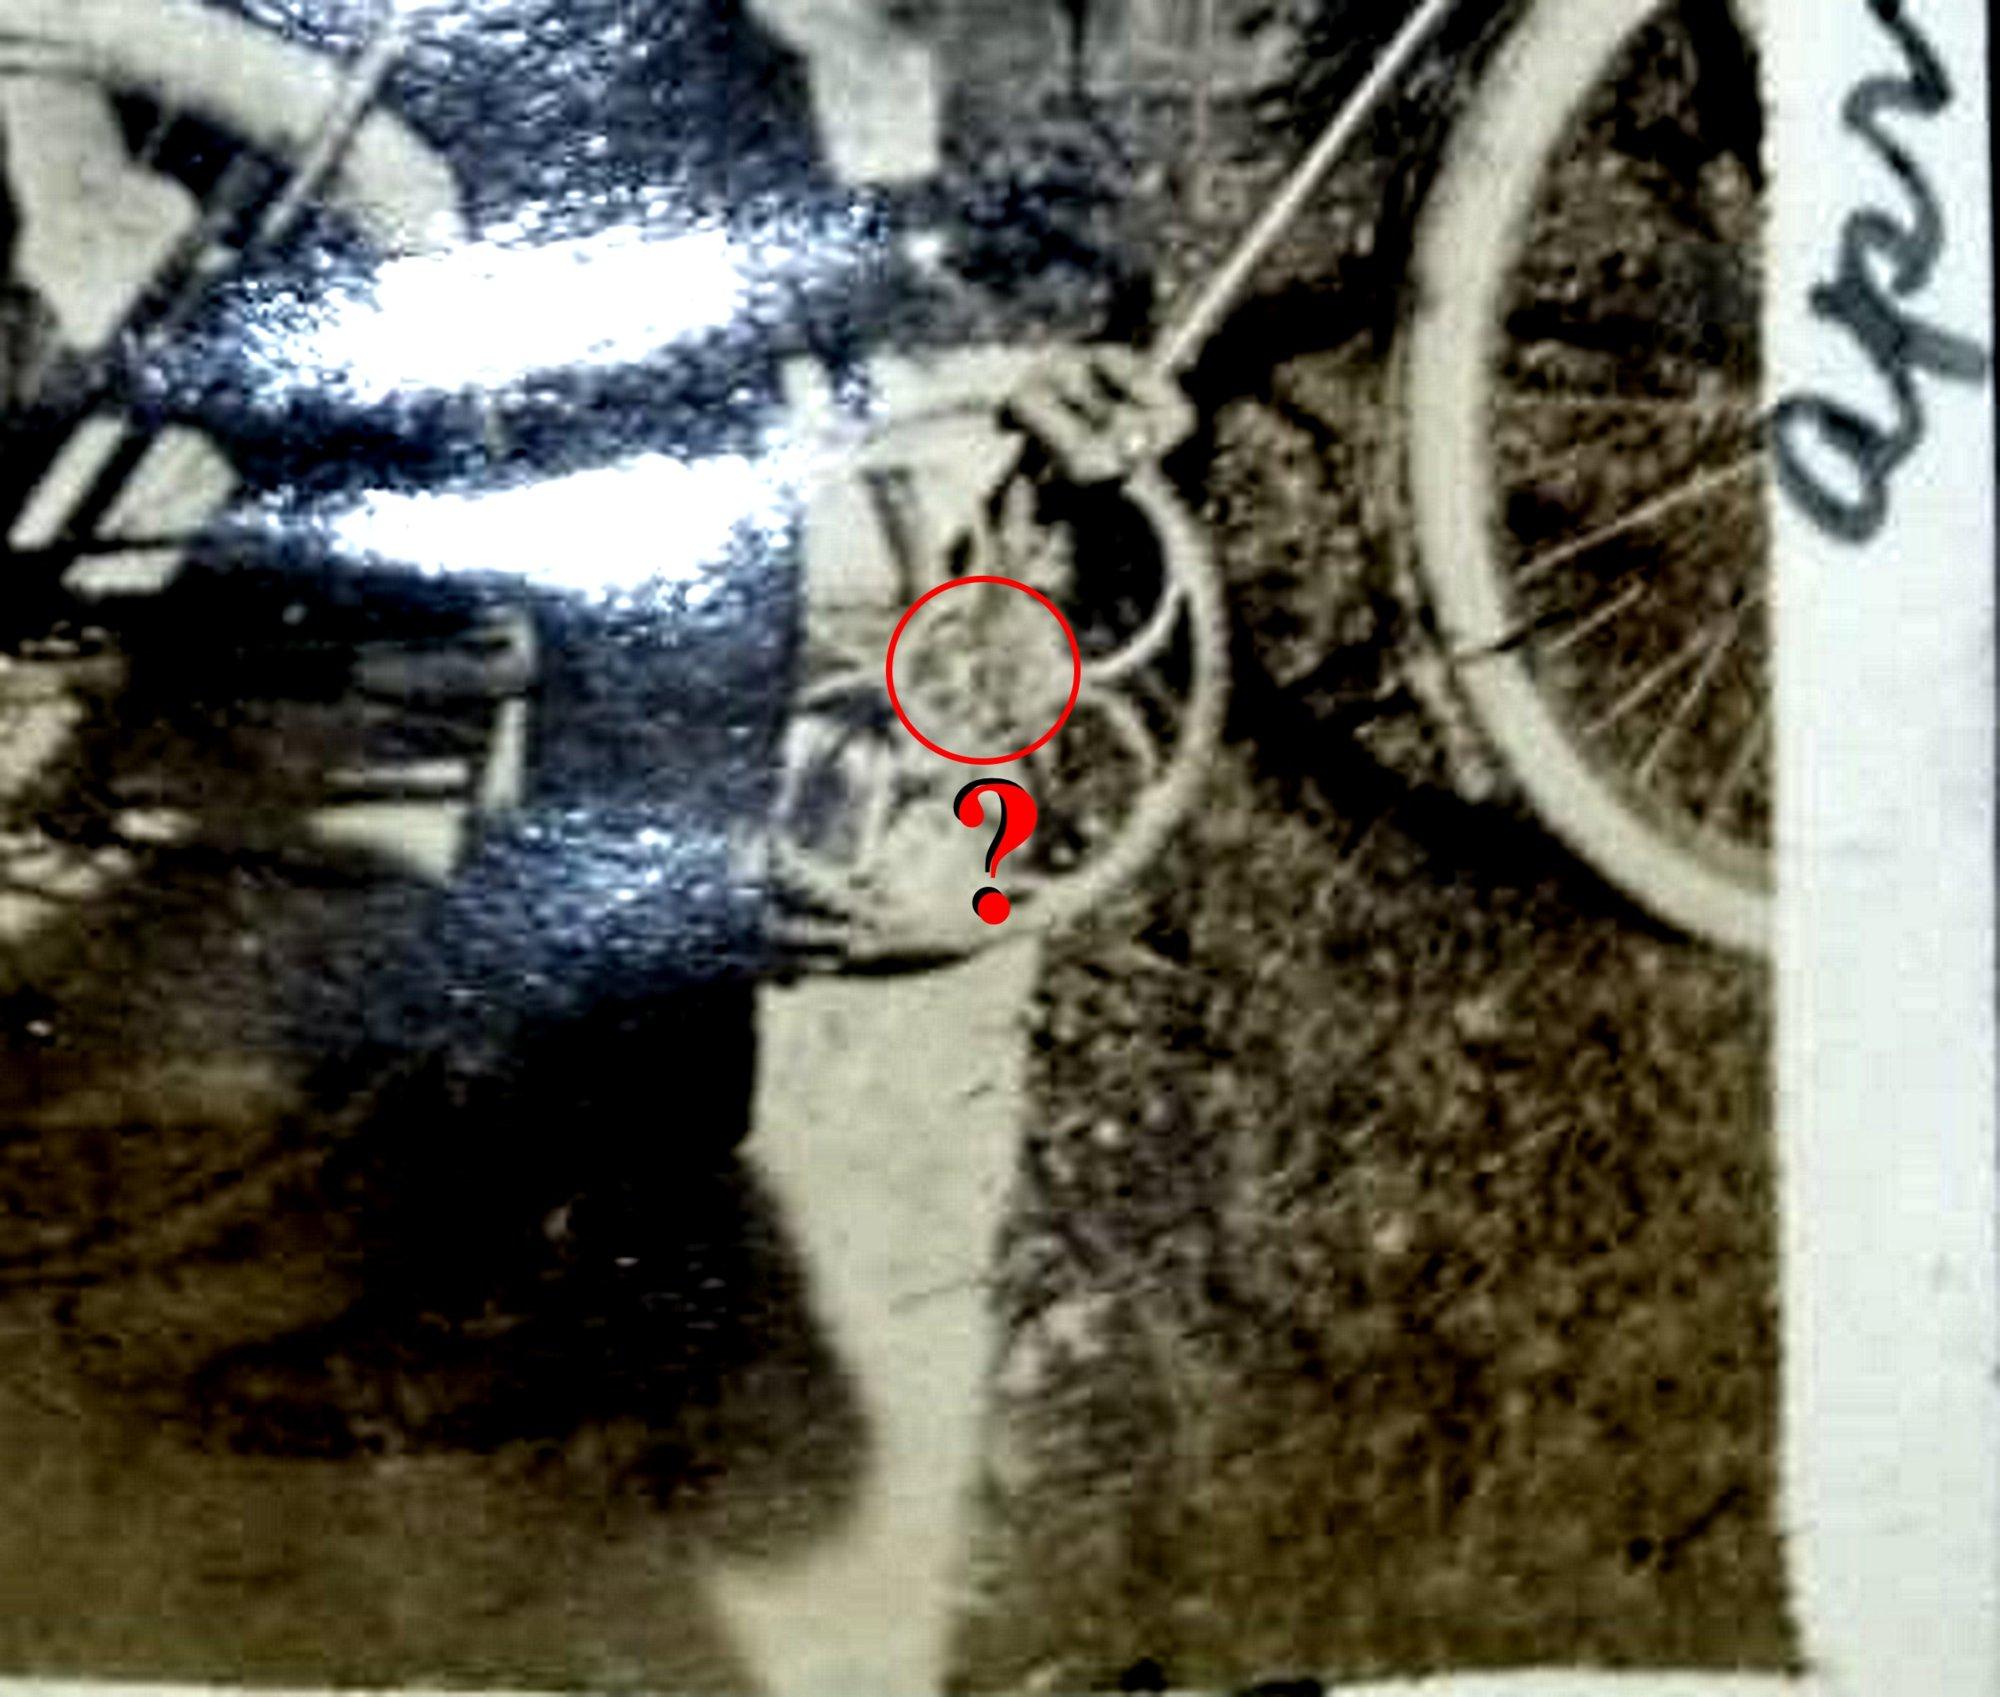 b591df7fd01de15bdb978d1dfb3f733e  big ring archbar bentwoody.jpg